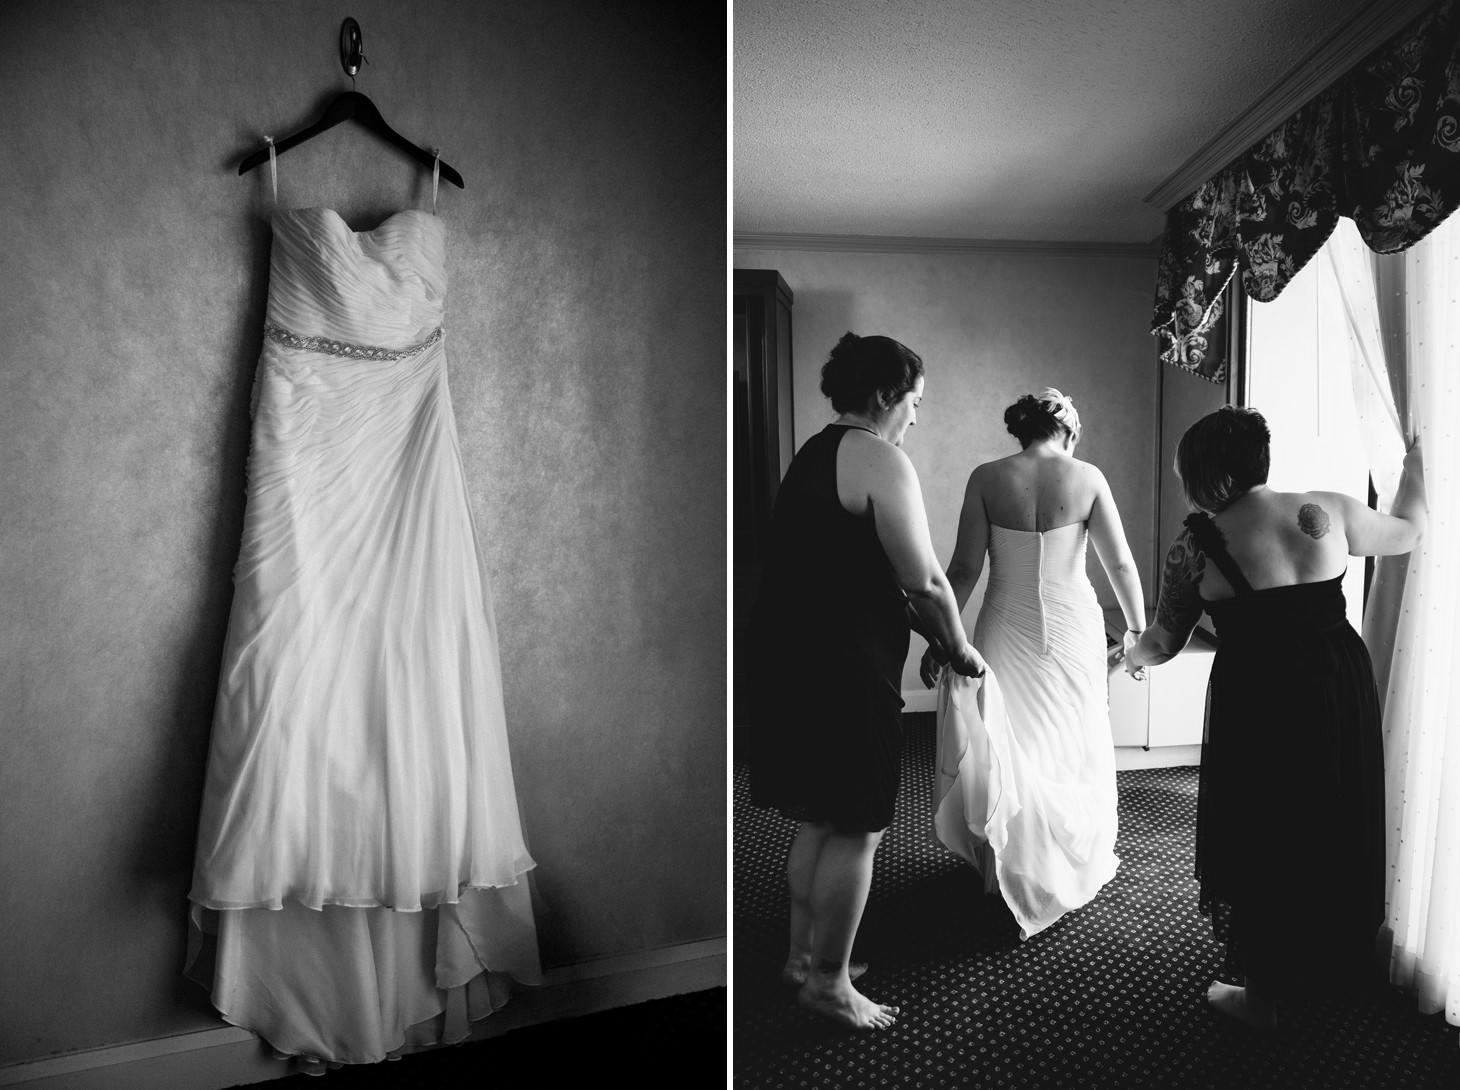 002x-nyc-wedding-photographer-nj-nerdy-dr-who-firehouse-wedding-smitten-chickens.jpg